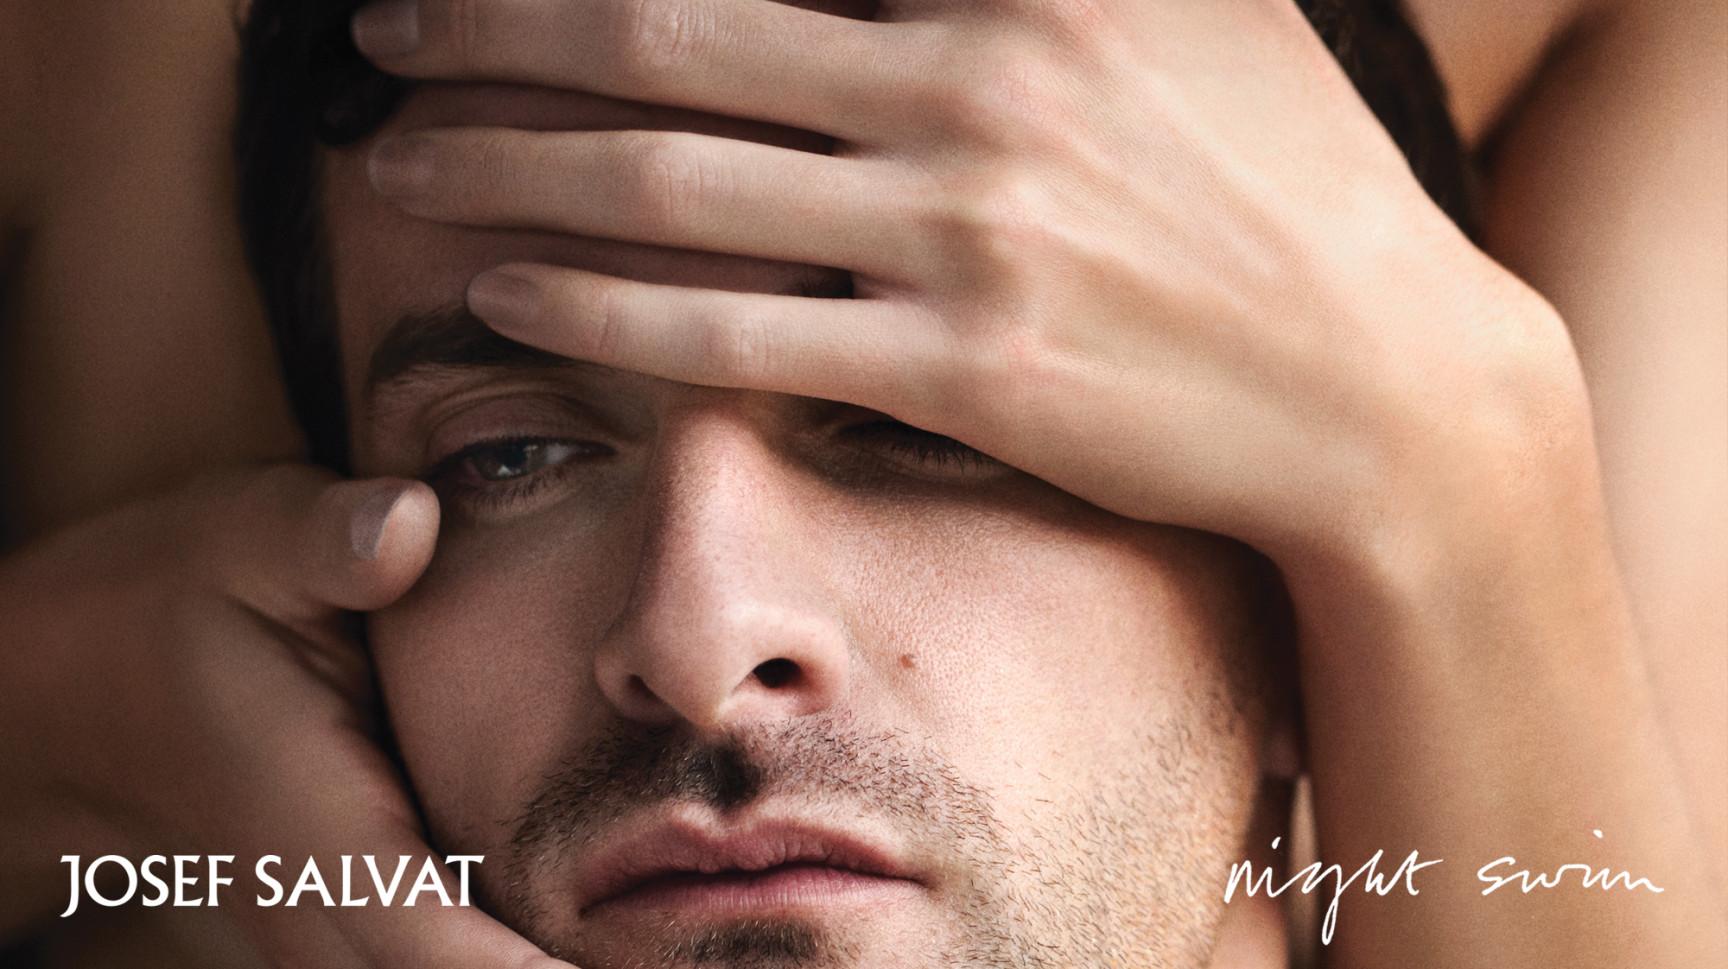 Music<br /><strong>Josef Salvat - Night Swim</strong>